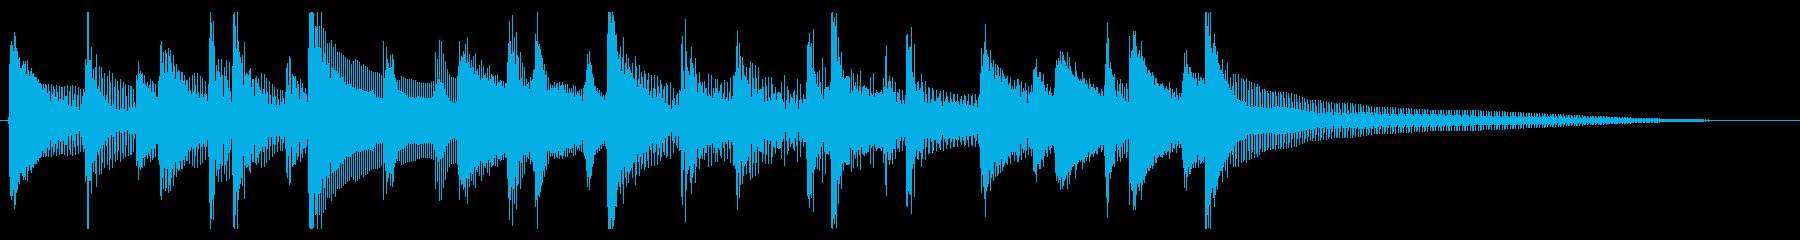 CM、Youtube等、ウクレレジングルの再生済みの波形